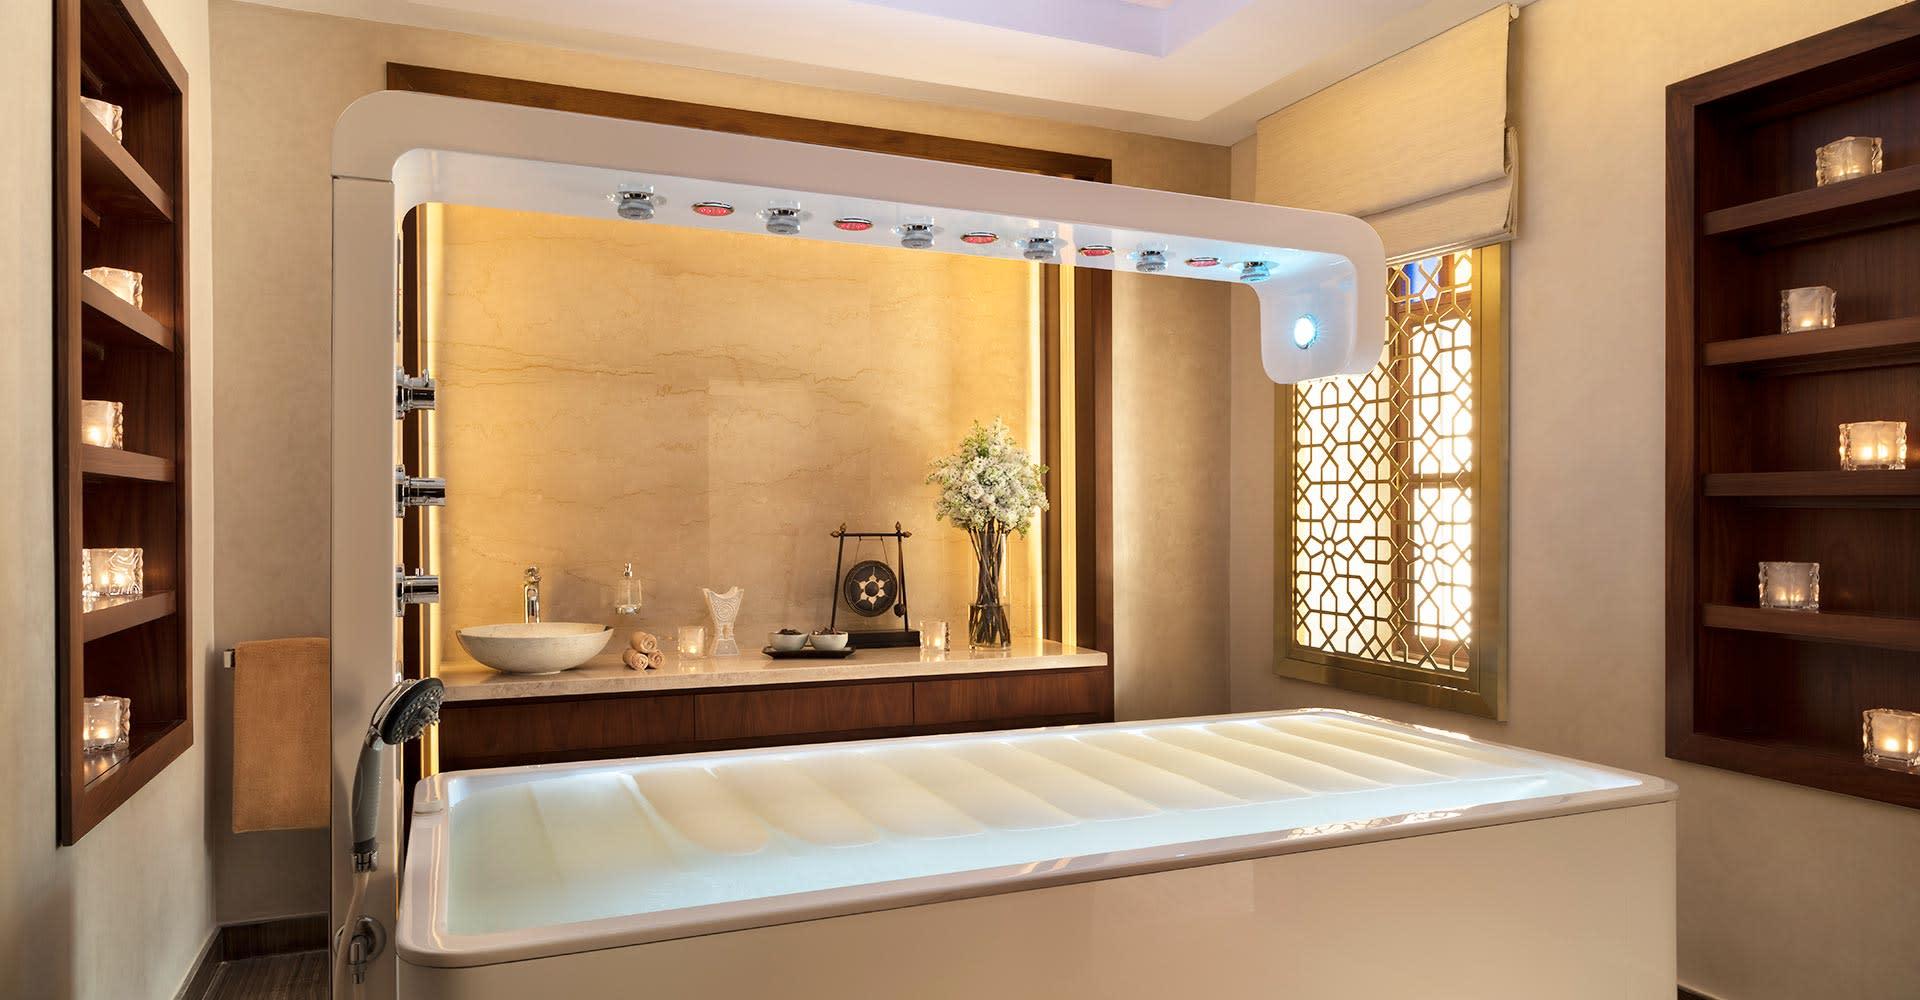 Spa in Doha Qatar | Tivoli Spa at Souq Al Wakra Hotel Qatar By Tivoli